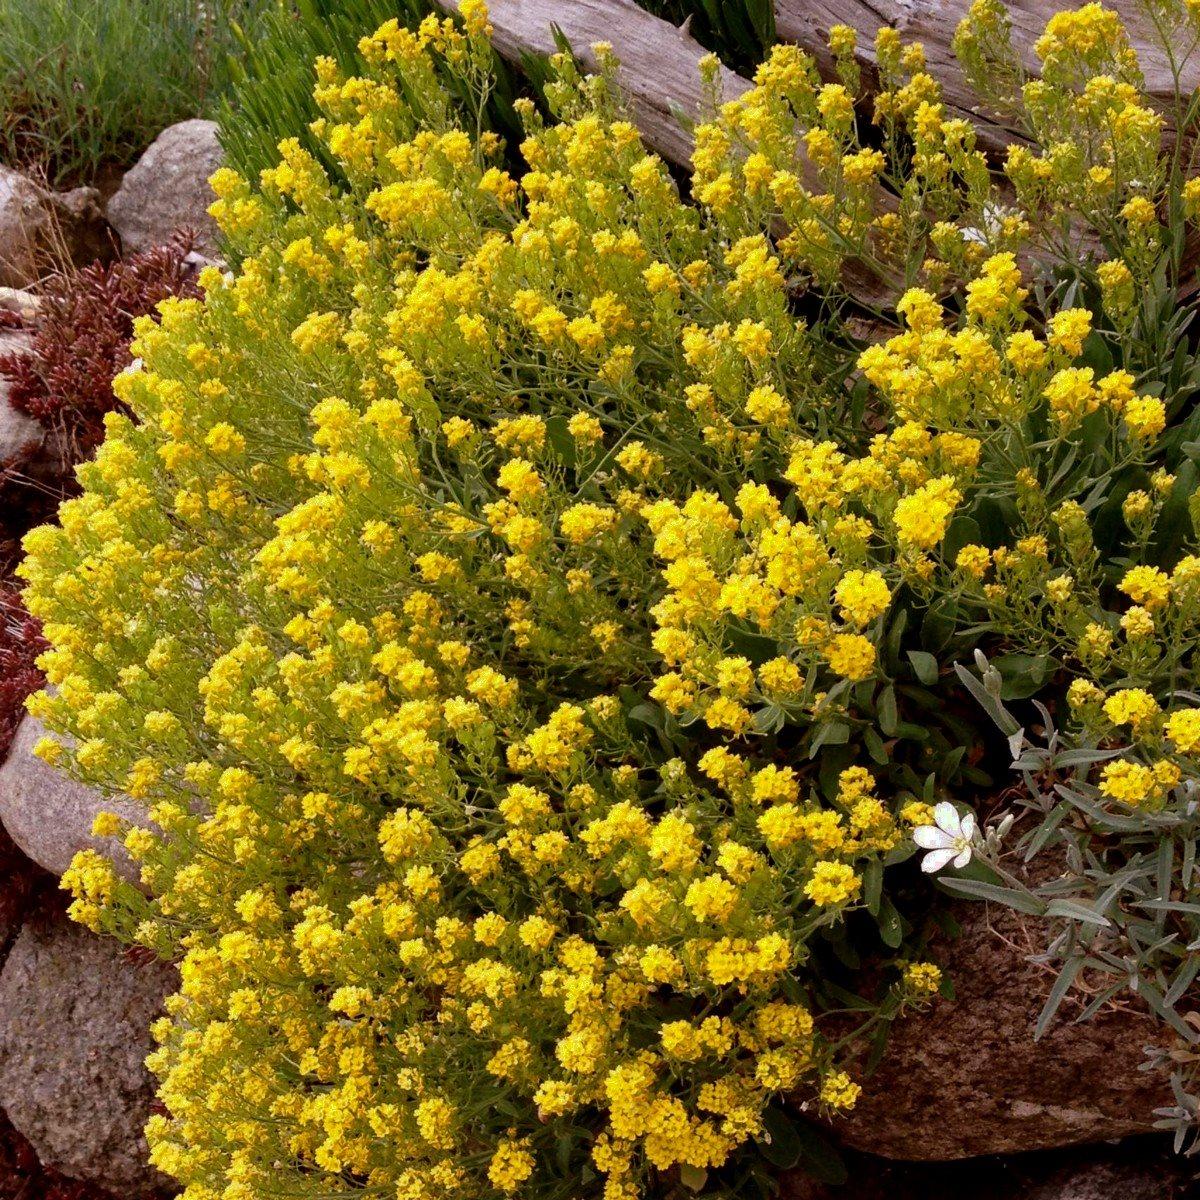 berg steinkraut alyssum berggold staude trockenmauer sonnig k bel pflanze ebay. Black Bedroom Furniture Sets. Home Design Ideas